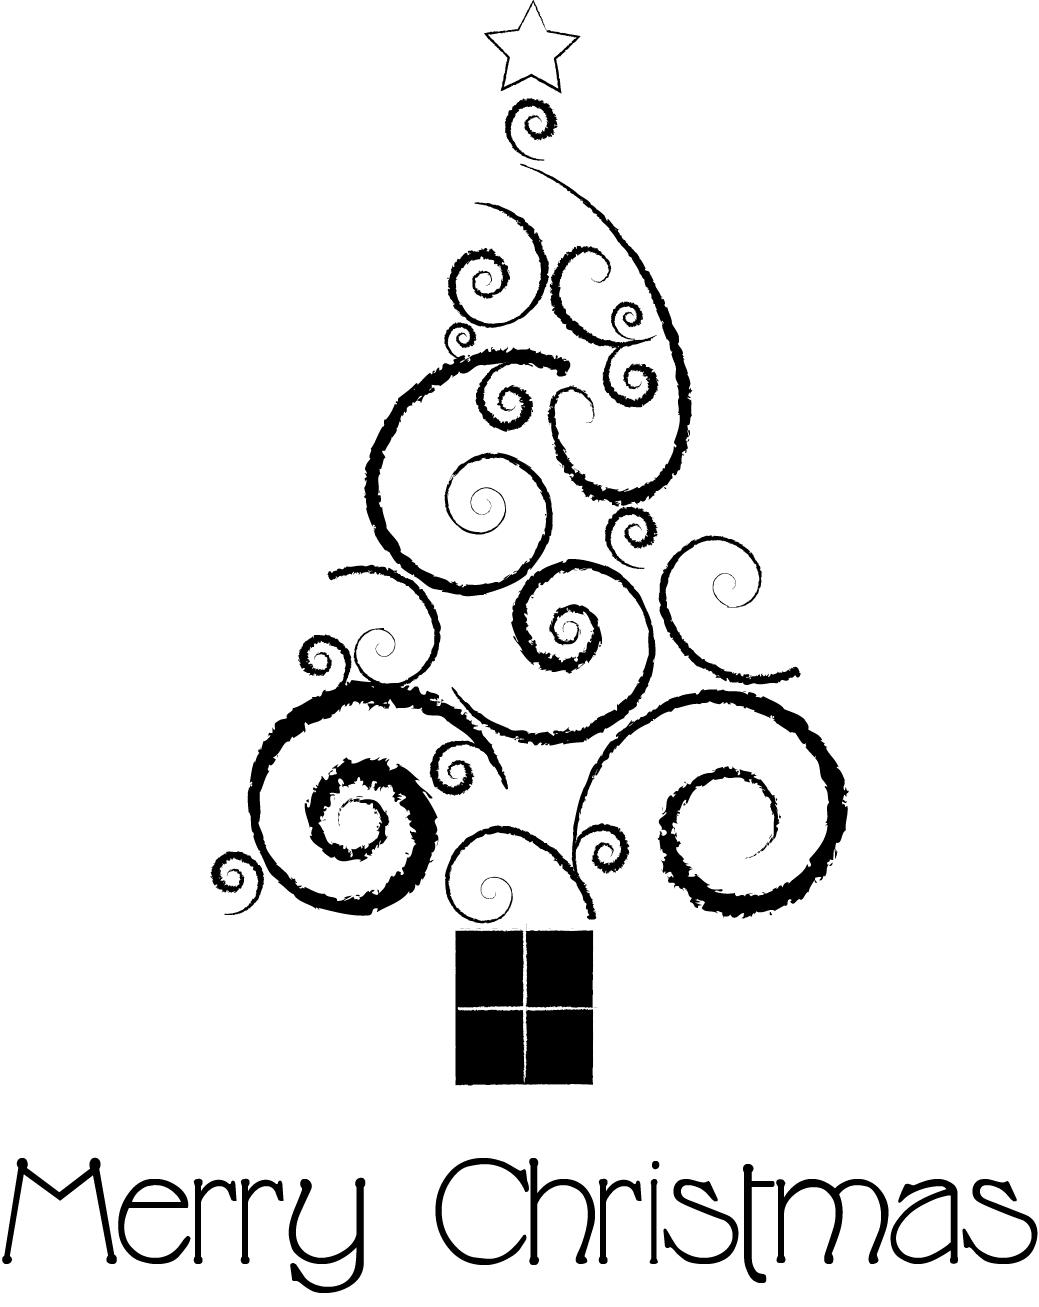 Line Drawing Xmas : Christmas tree line drawing cliparts